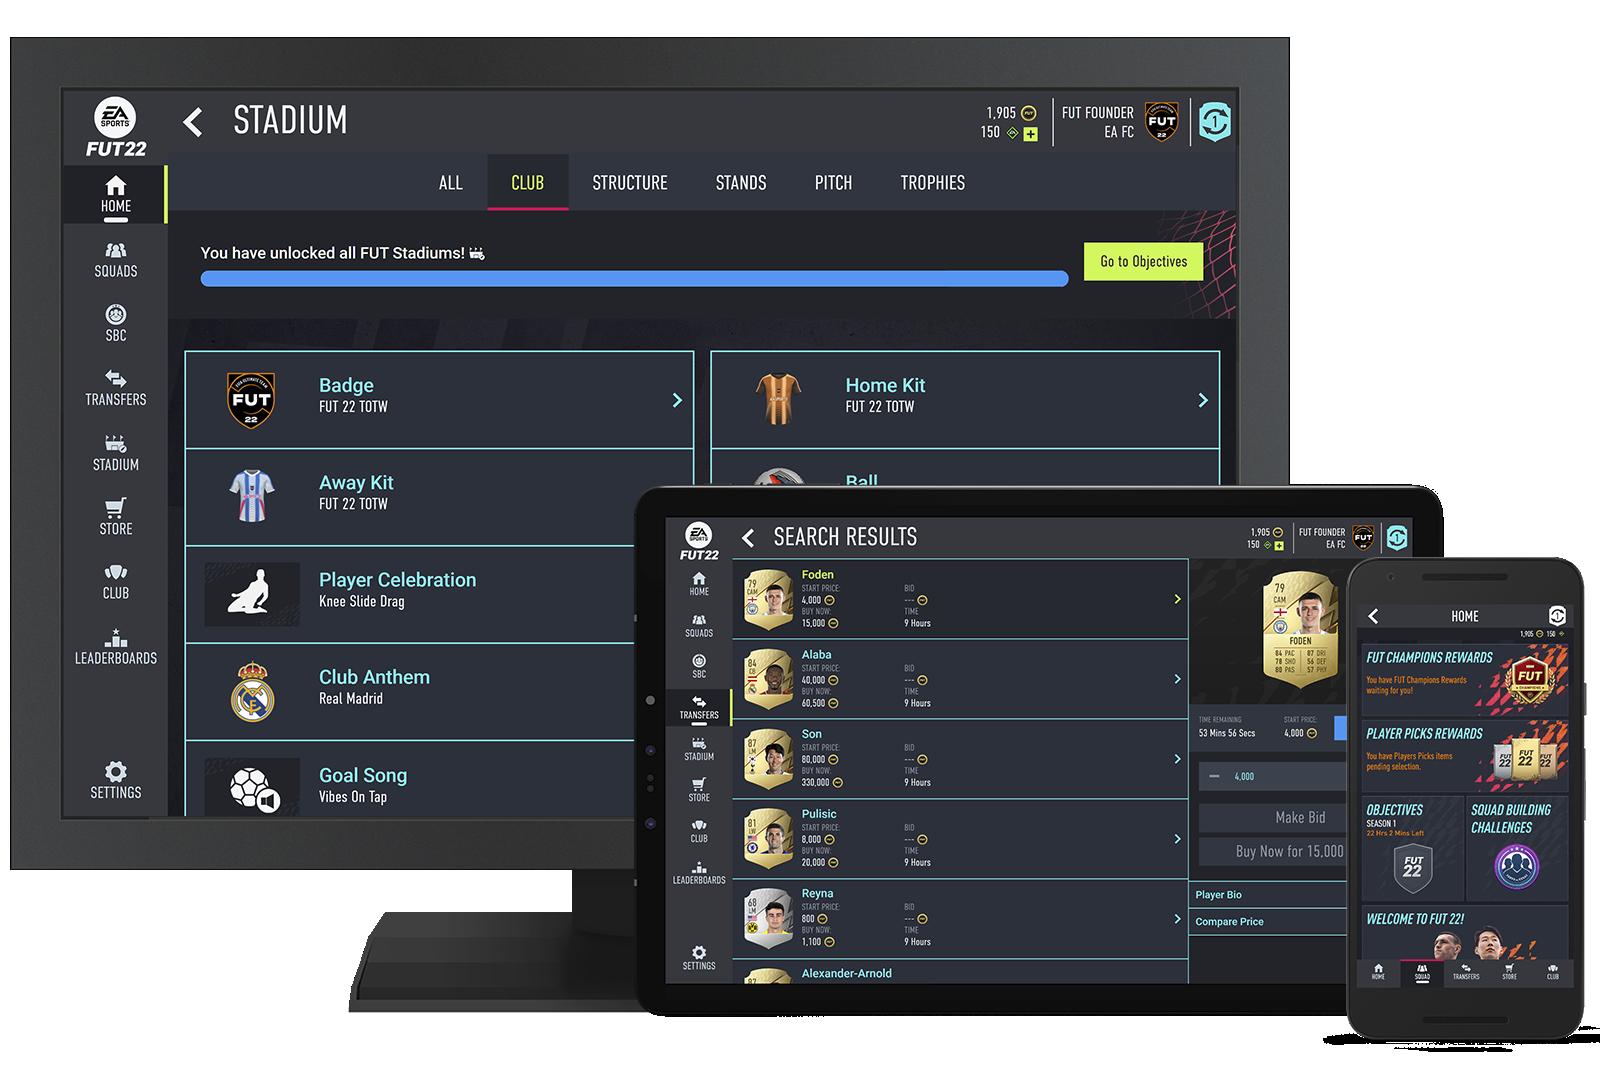 FIFA Ultimate Team - Companion app image